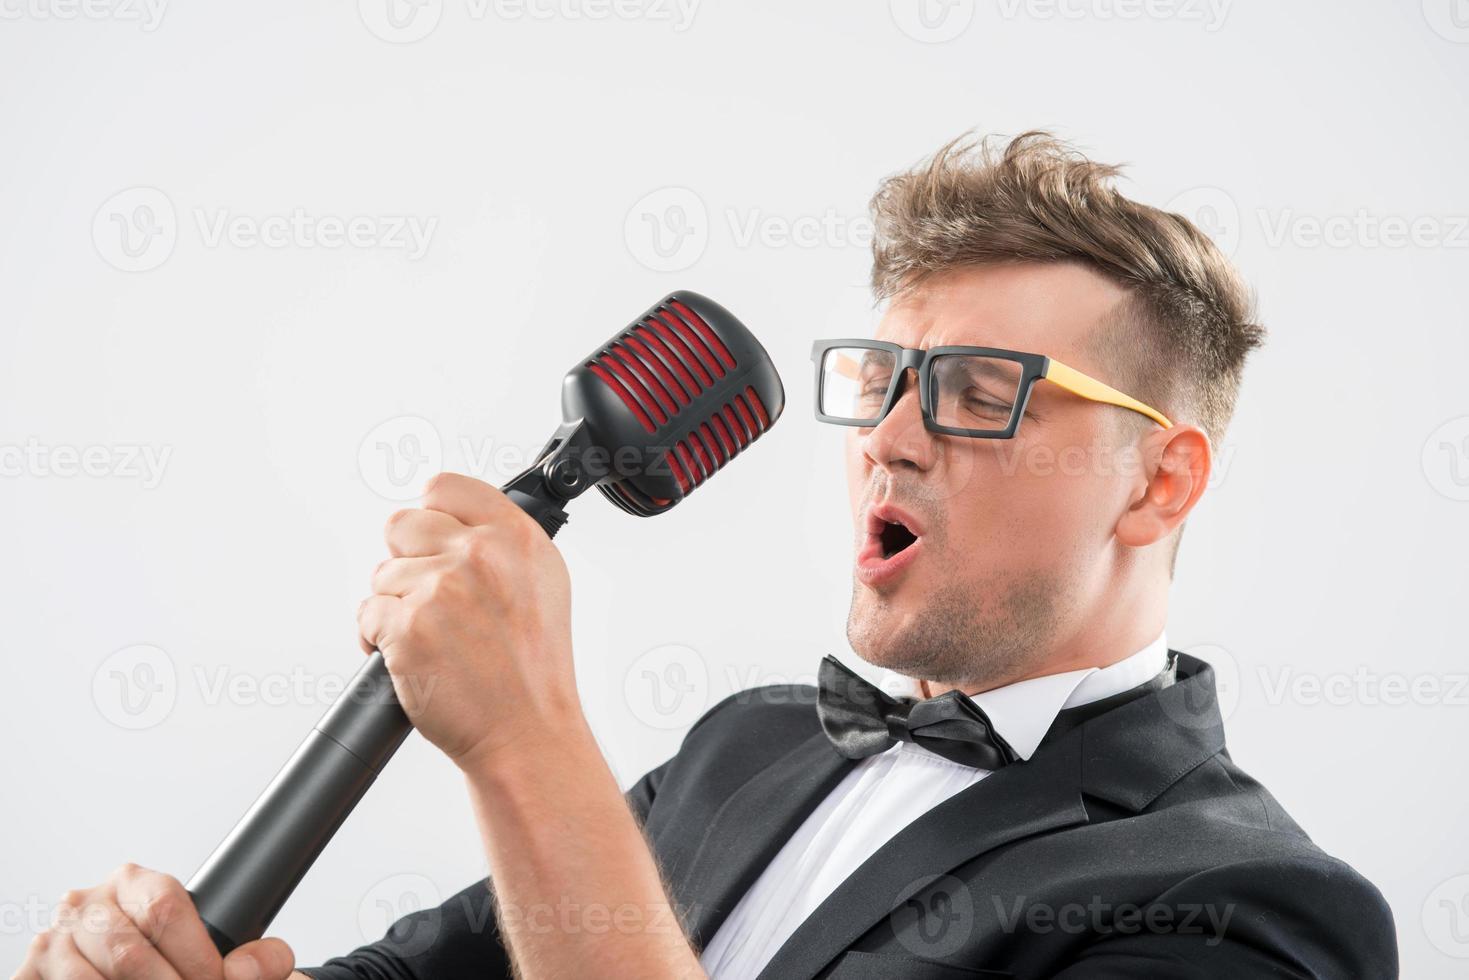 mc singt im mikrofon foto